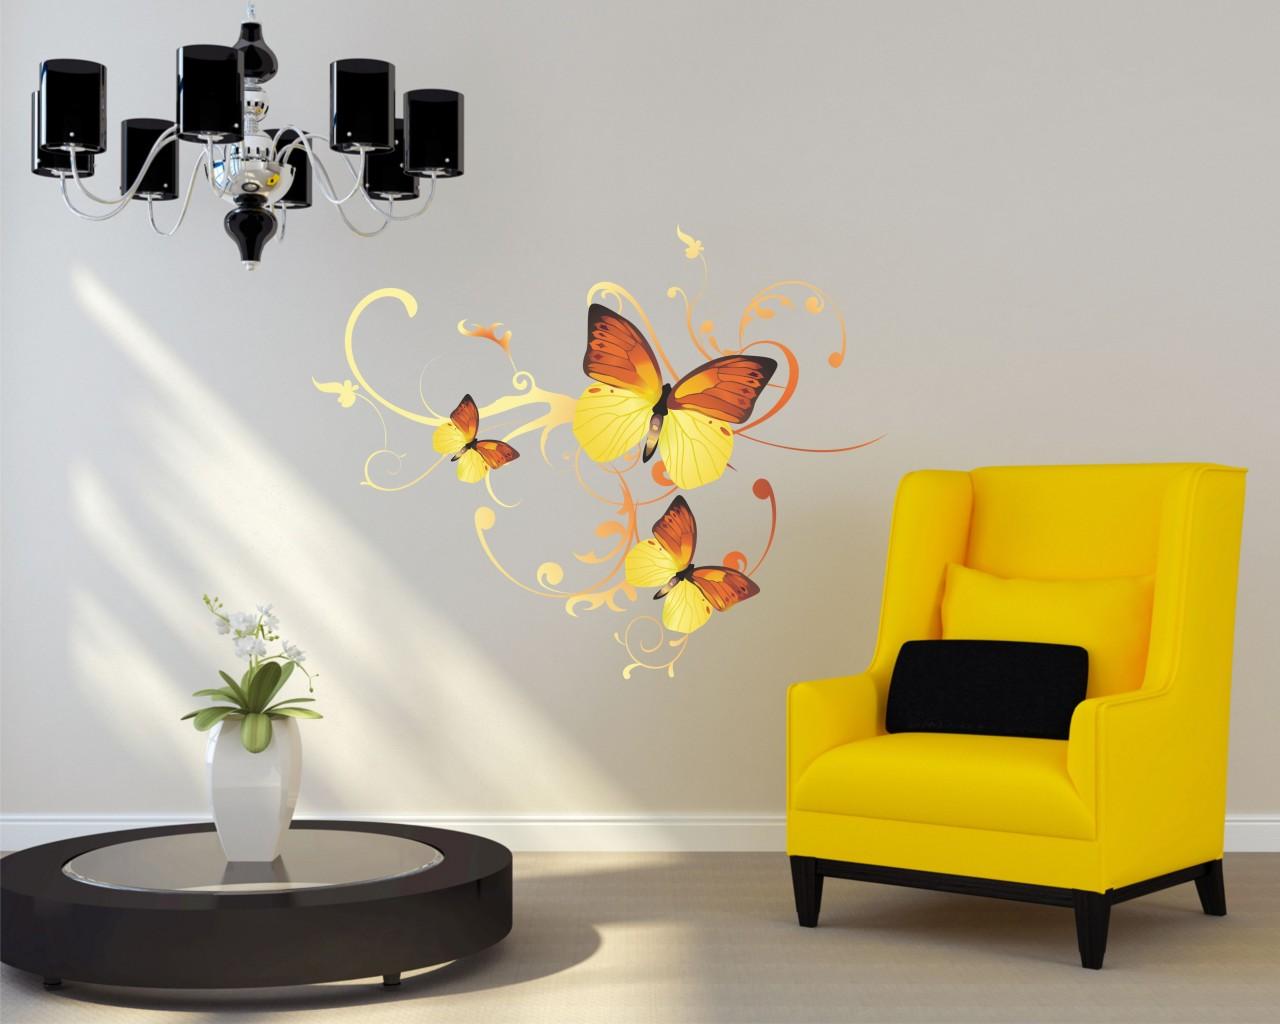 adesivo murale-farfalle tra decori 2